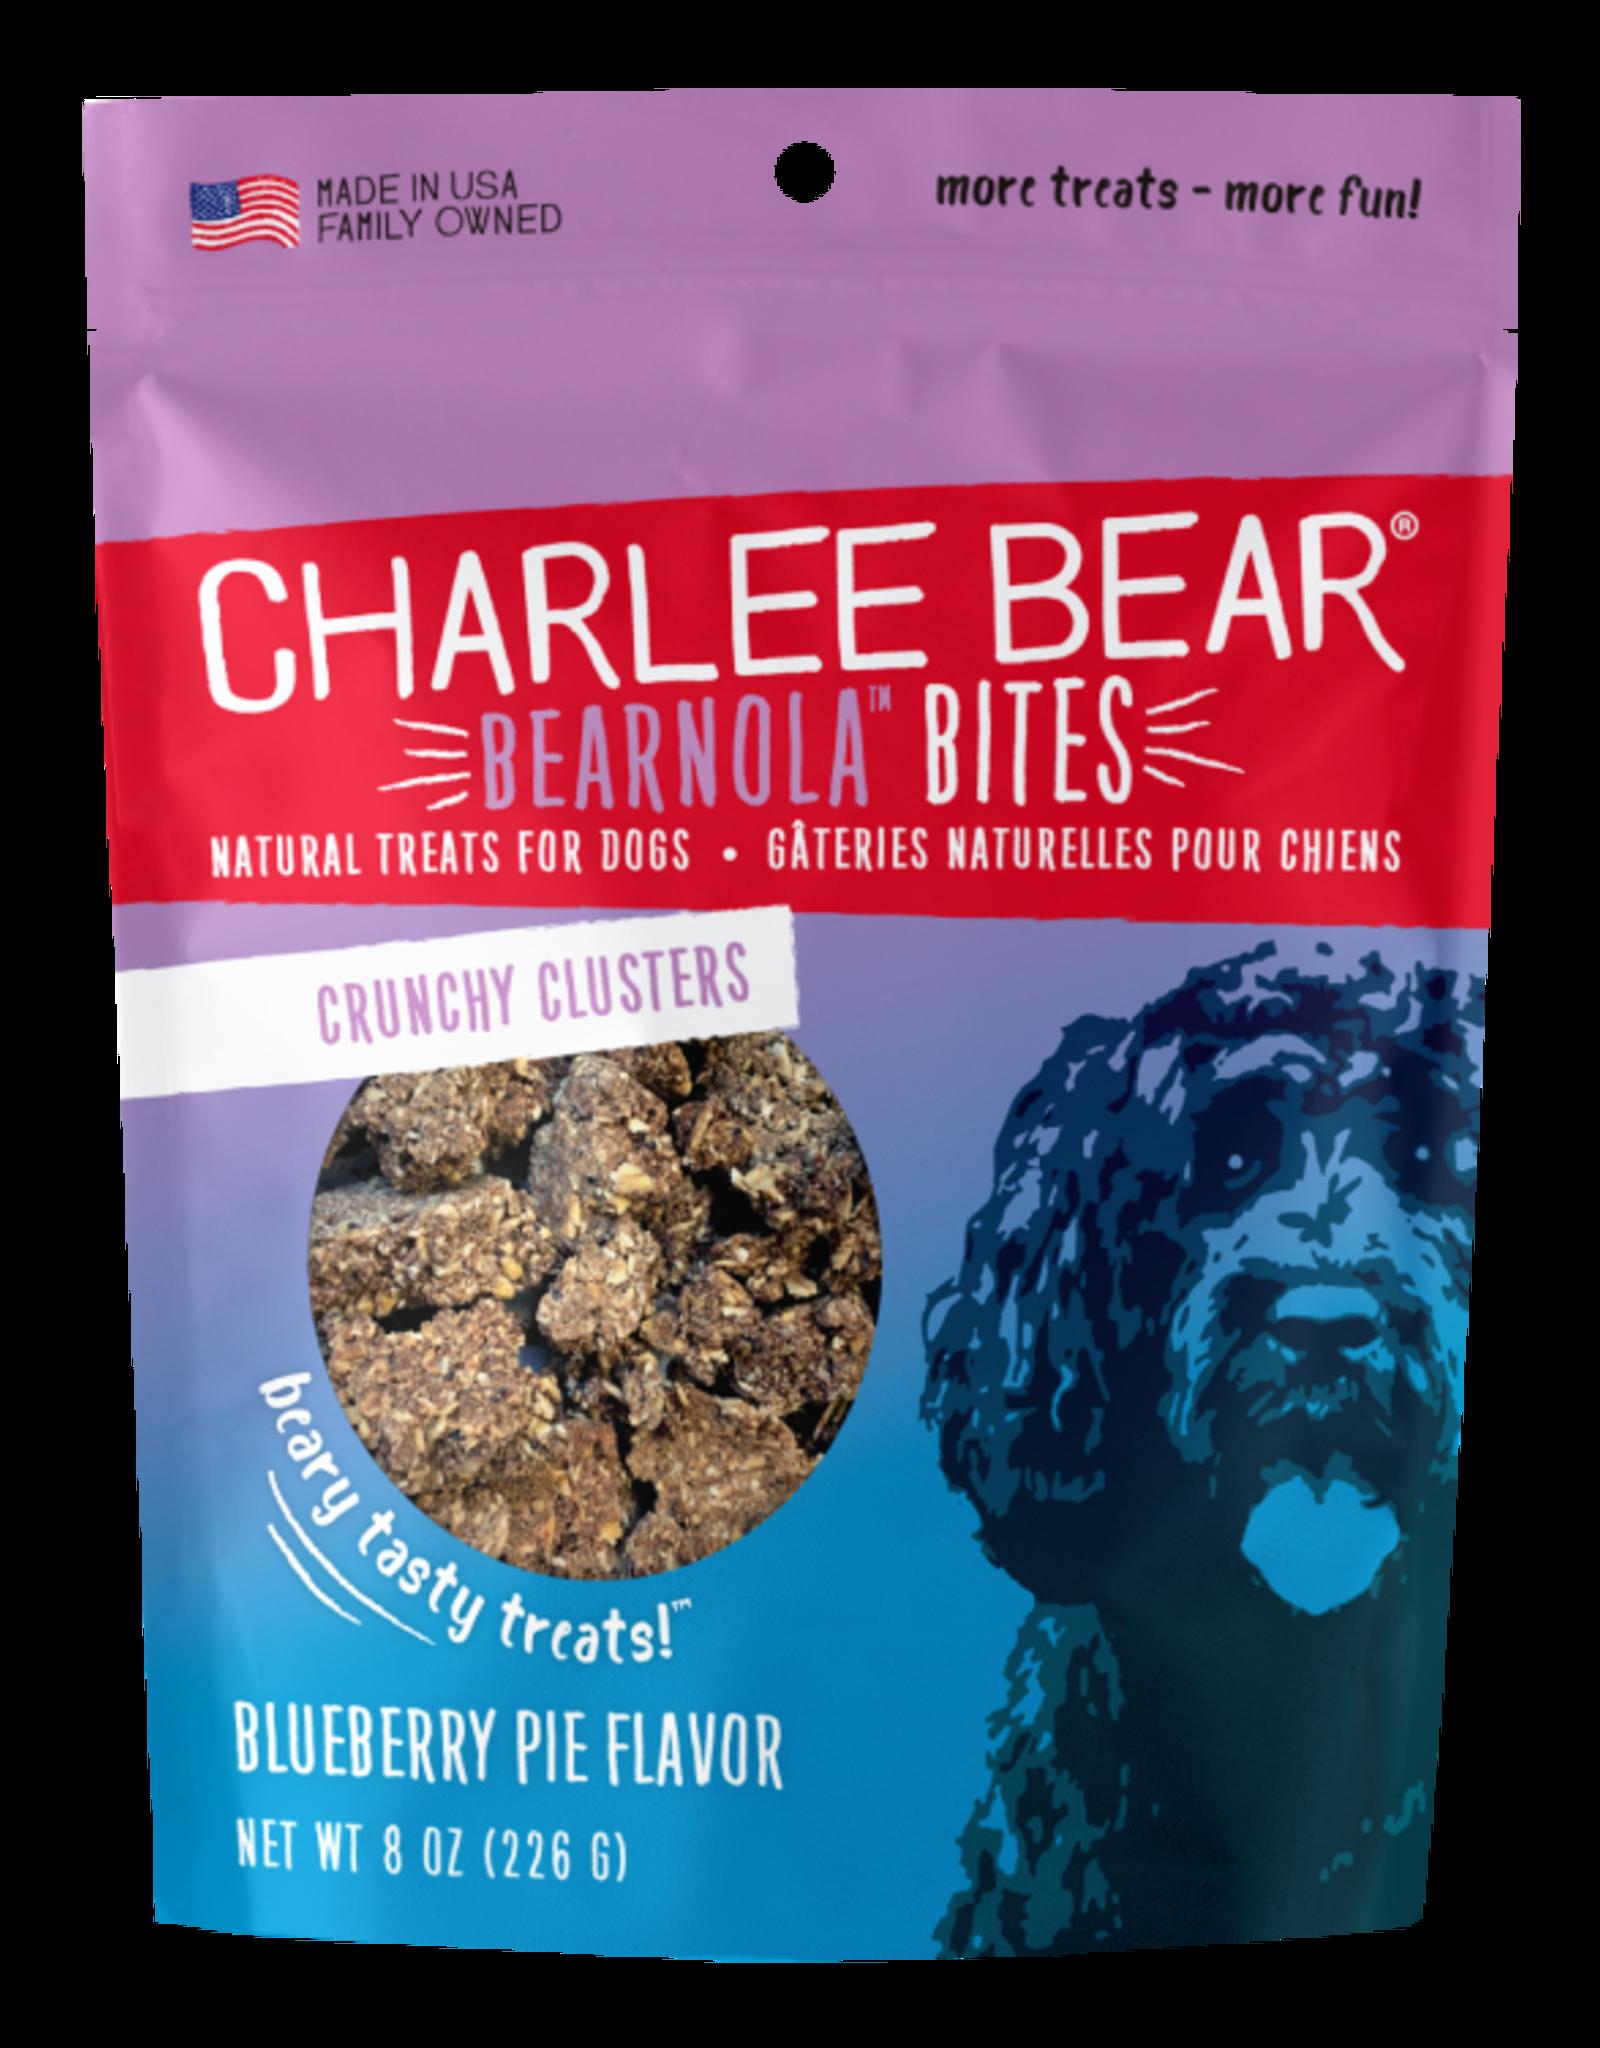 Charlee Bear Bearnola Bites Blueberry Pie Flavor